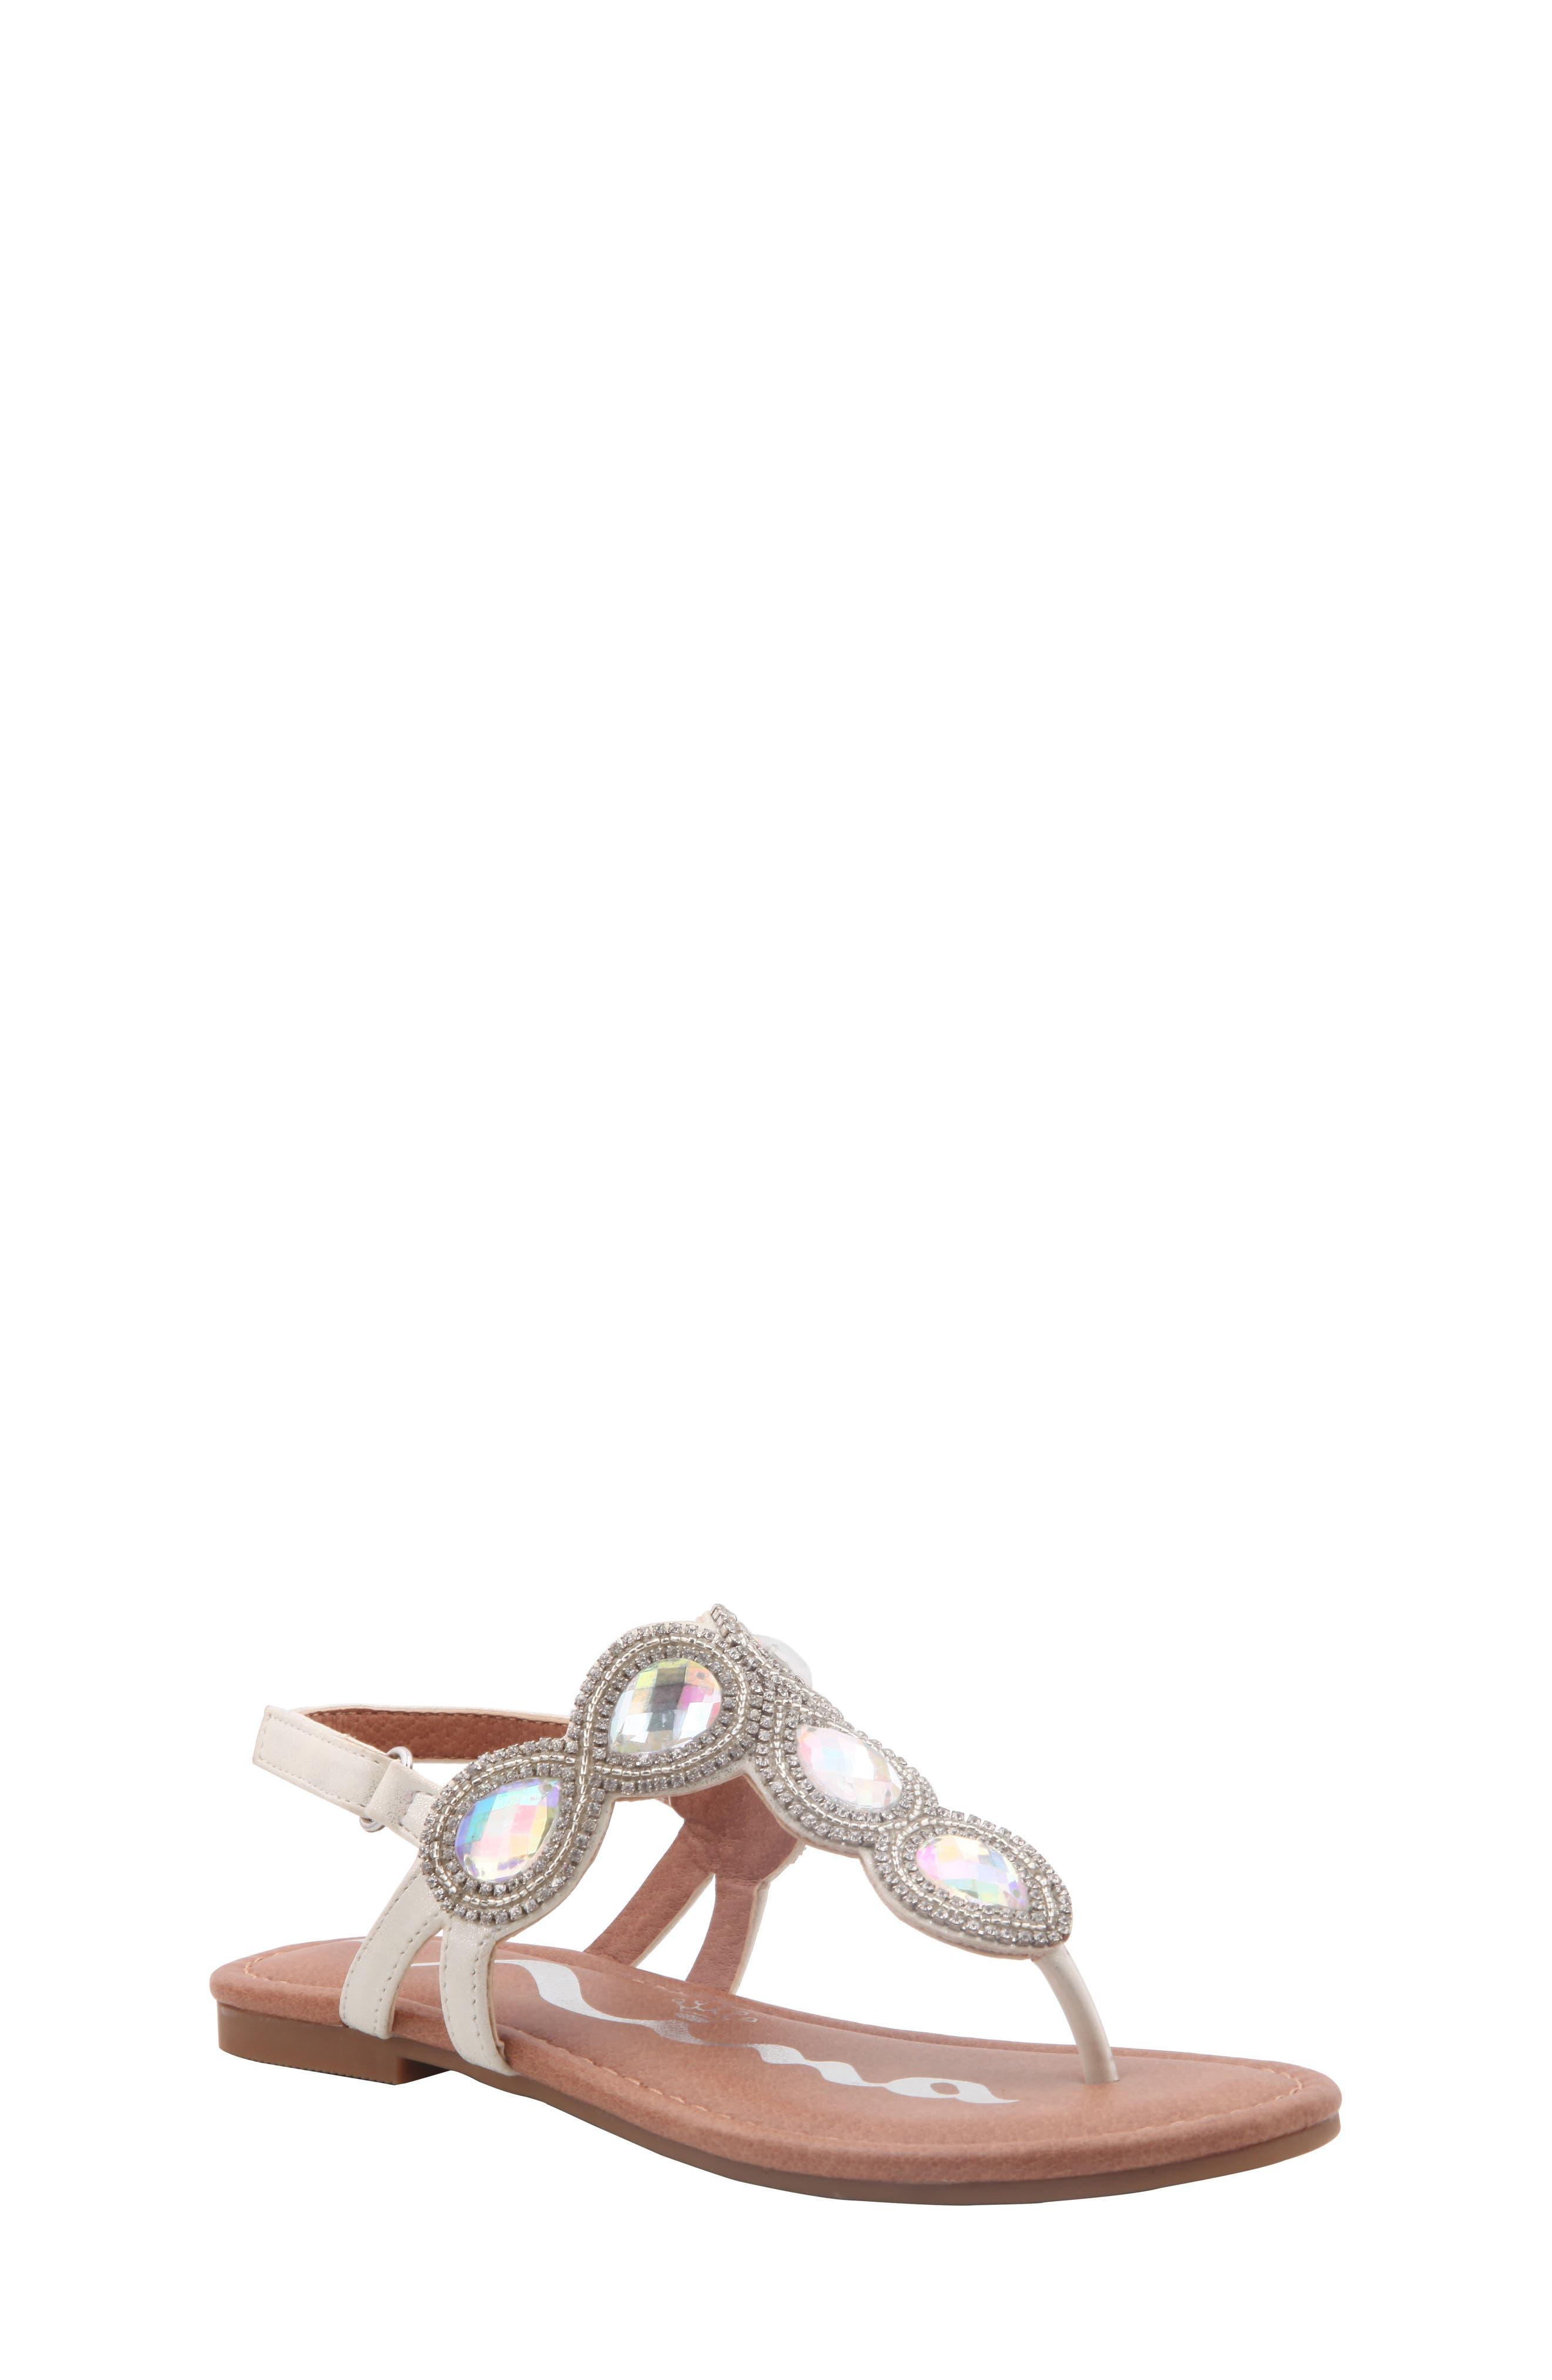 Elicia Embellished T-Strap Sandal,                         Main,                         color, SILVER METALLIC